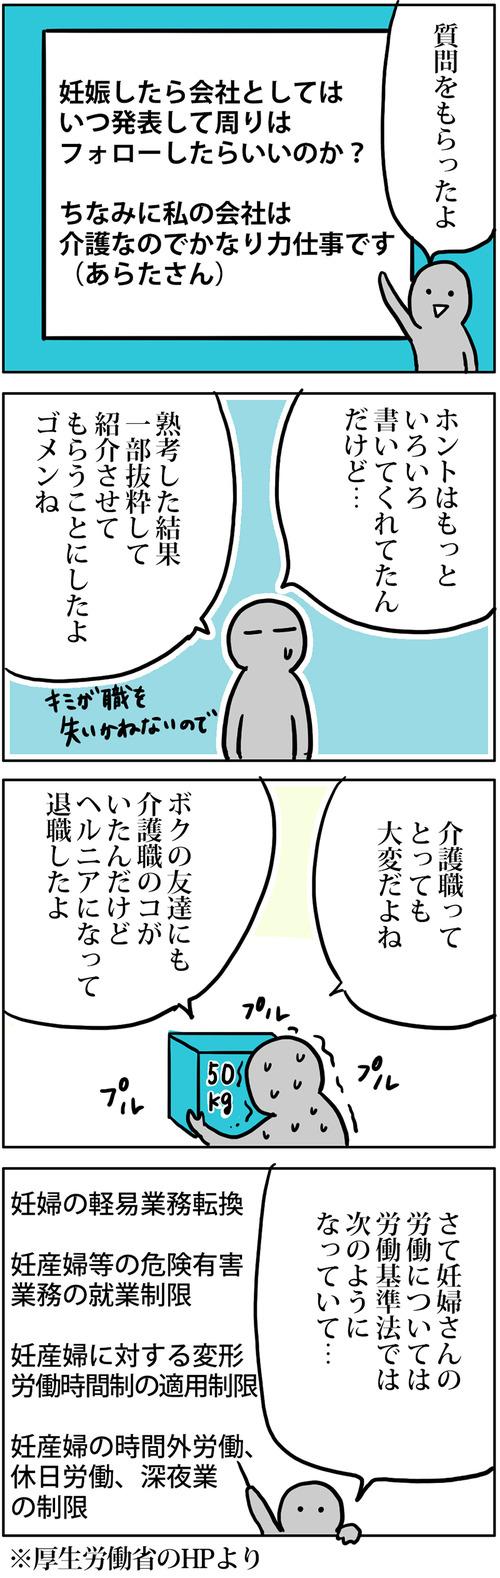 zangyo_170226_1